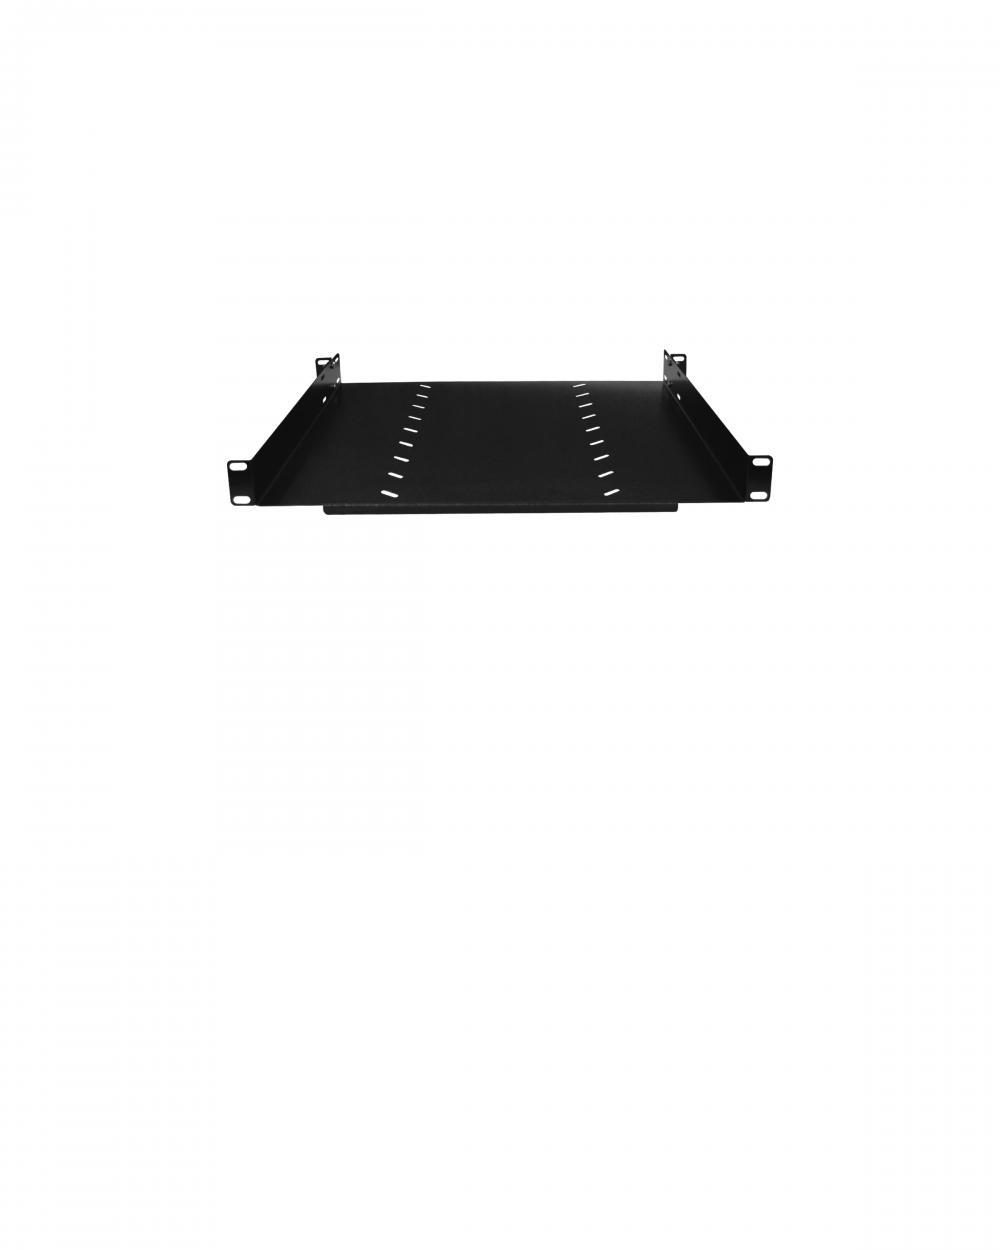 Bandeja Frontal Fixa Padrão 19'' 1U x 500mm